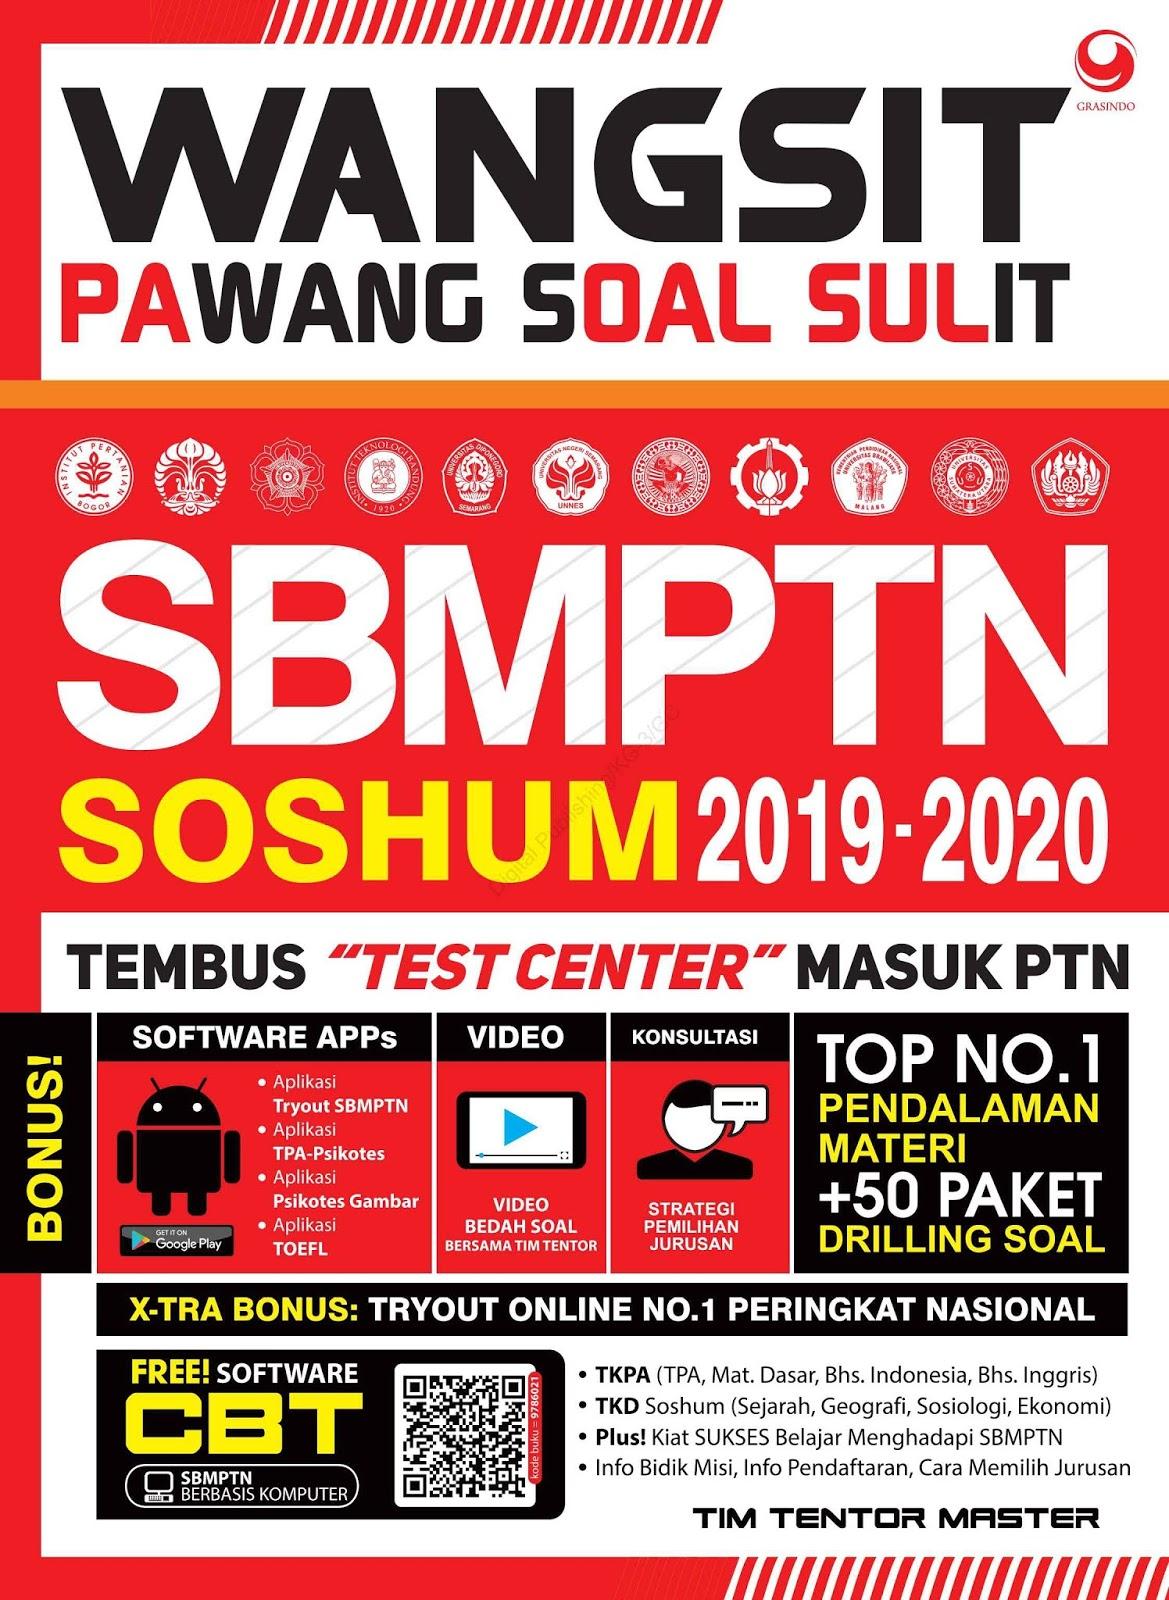 Wangsit (Pawang Soal Sulit) SBMPTN SOSHUM